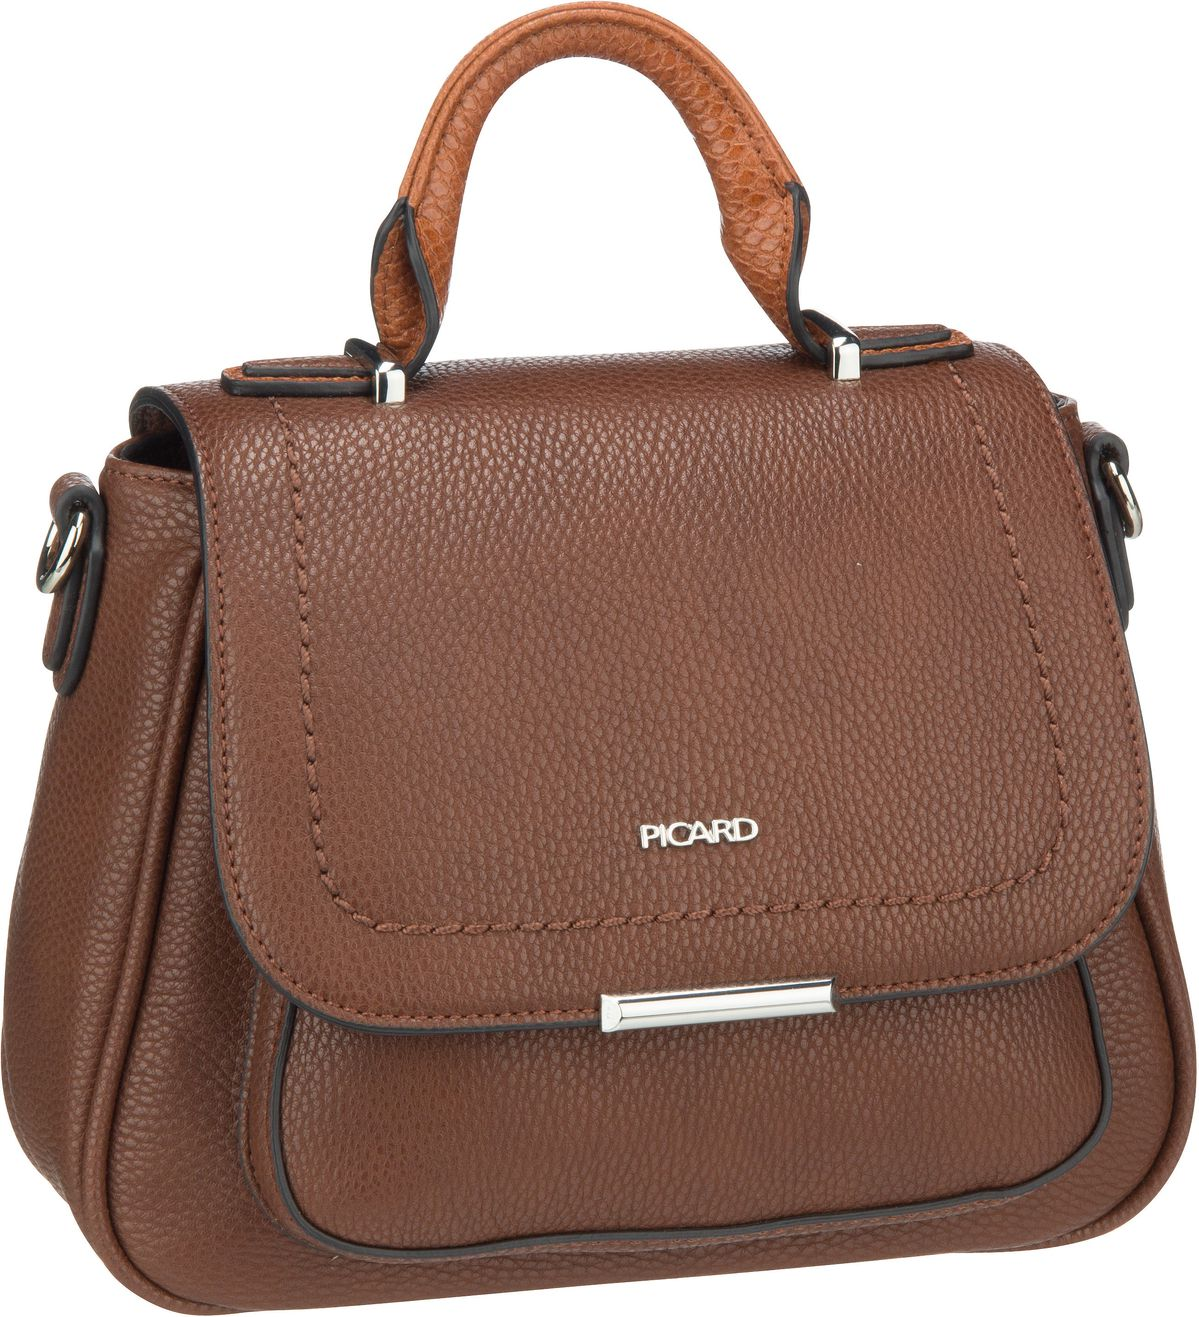 Handtasche Classy 2771 Whisky